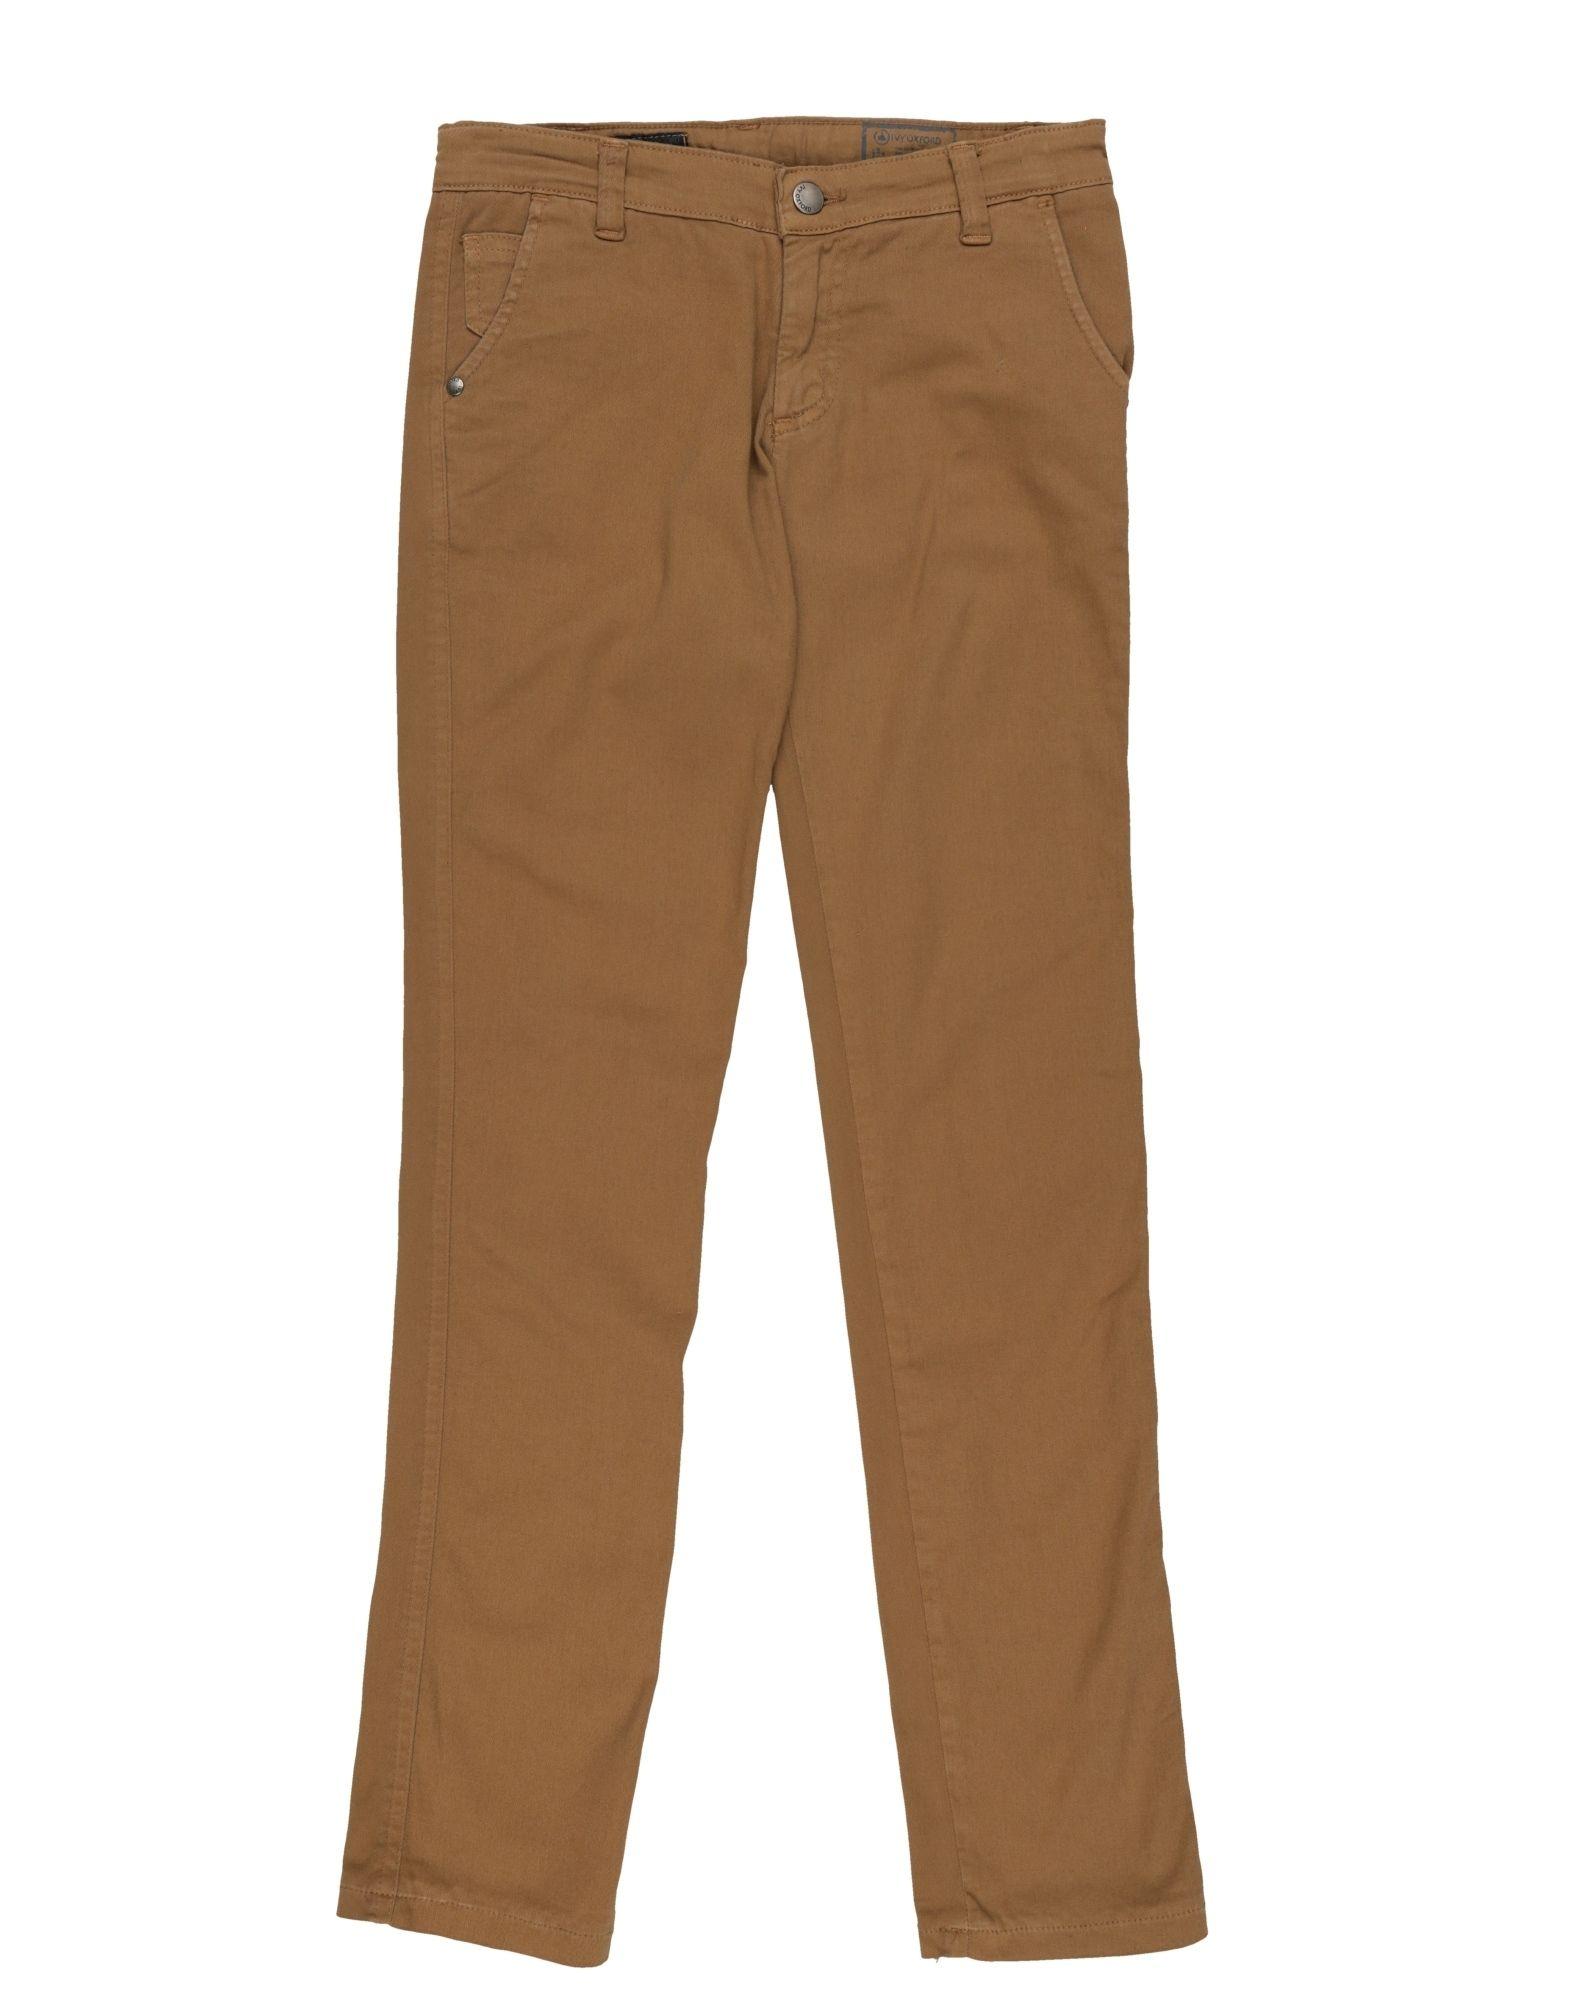 IVY OXFORD Повседневные брюки oxford borboniqua oxford